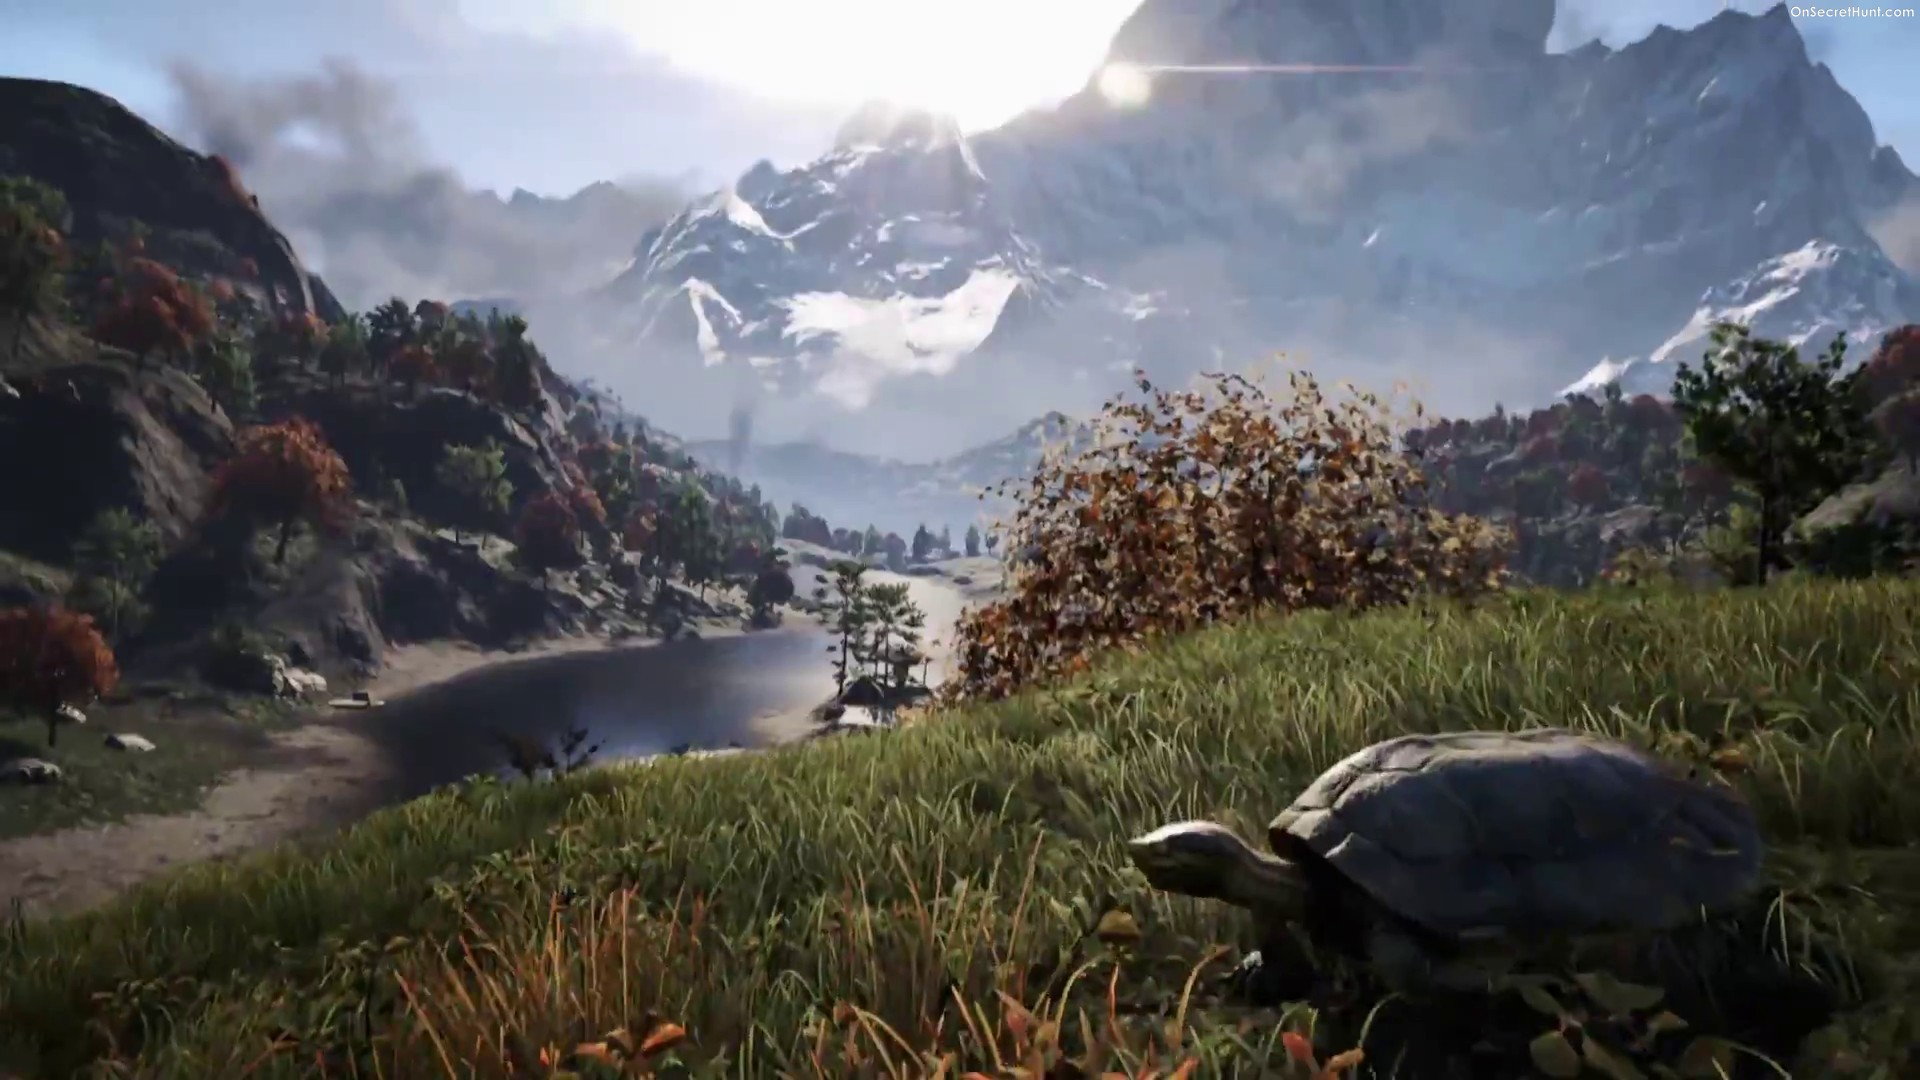 Far Cry 4 Wallpaper Elephant: Far Cry 4 Wallpapers HD